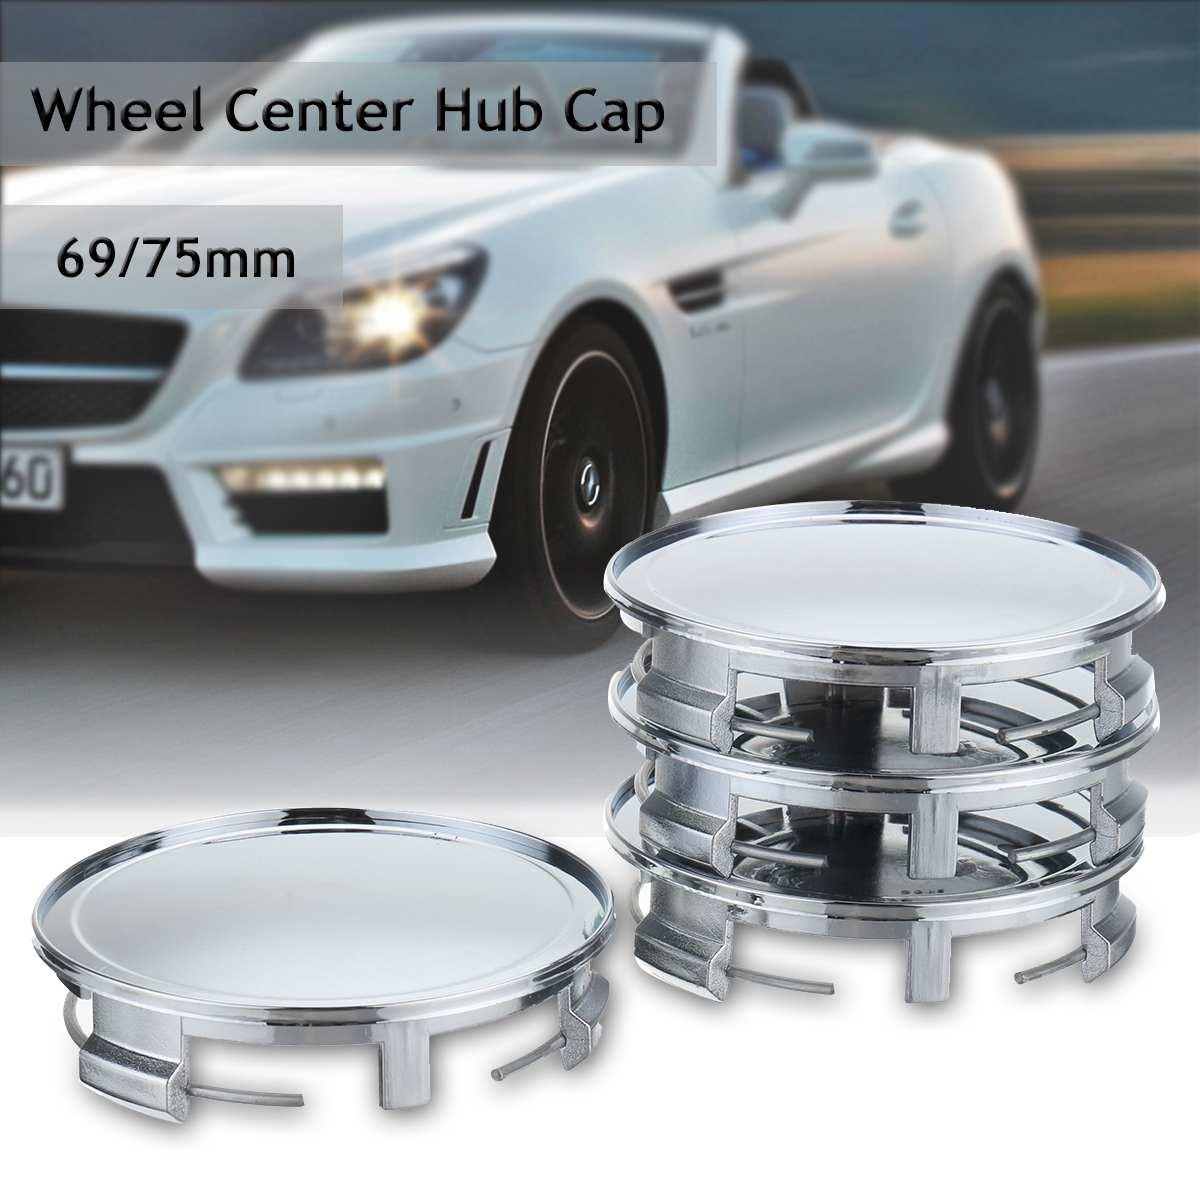 4 stücke 75mm Auto Chrom Rad Center Hub Abdeckung Kappe Radkappen Universal Für Mercedes/Benz S M G SLK CLK GLK Klasse